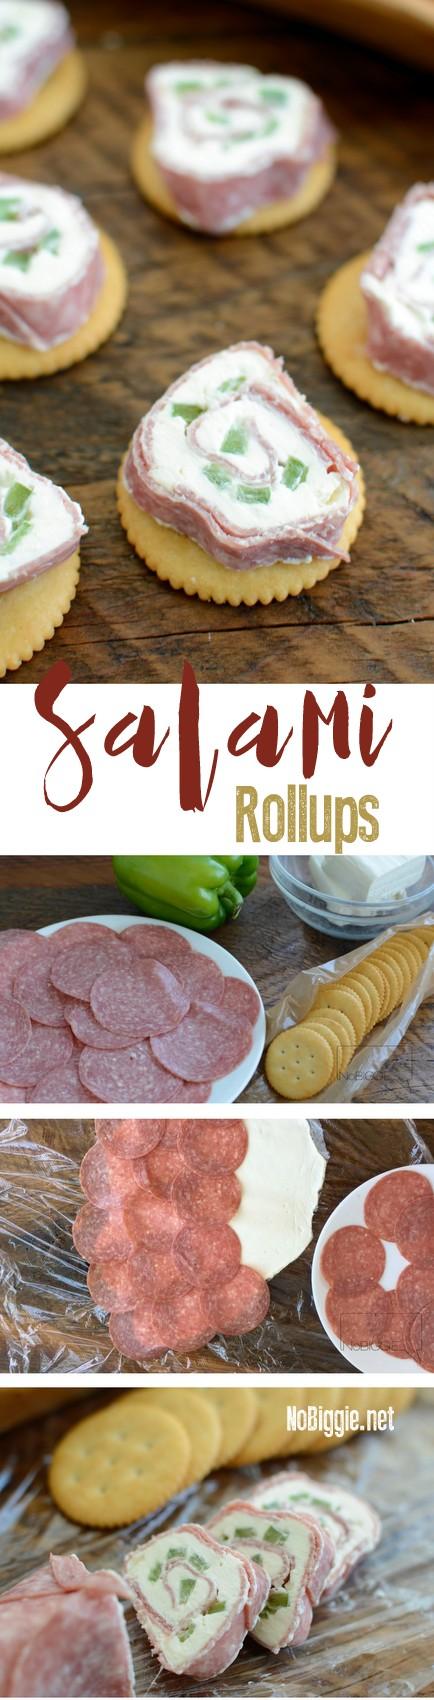 Salami Rollups Easy Appetizer | Watch the video | NoBiggie.net